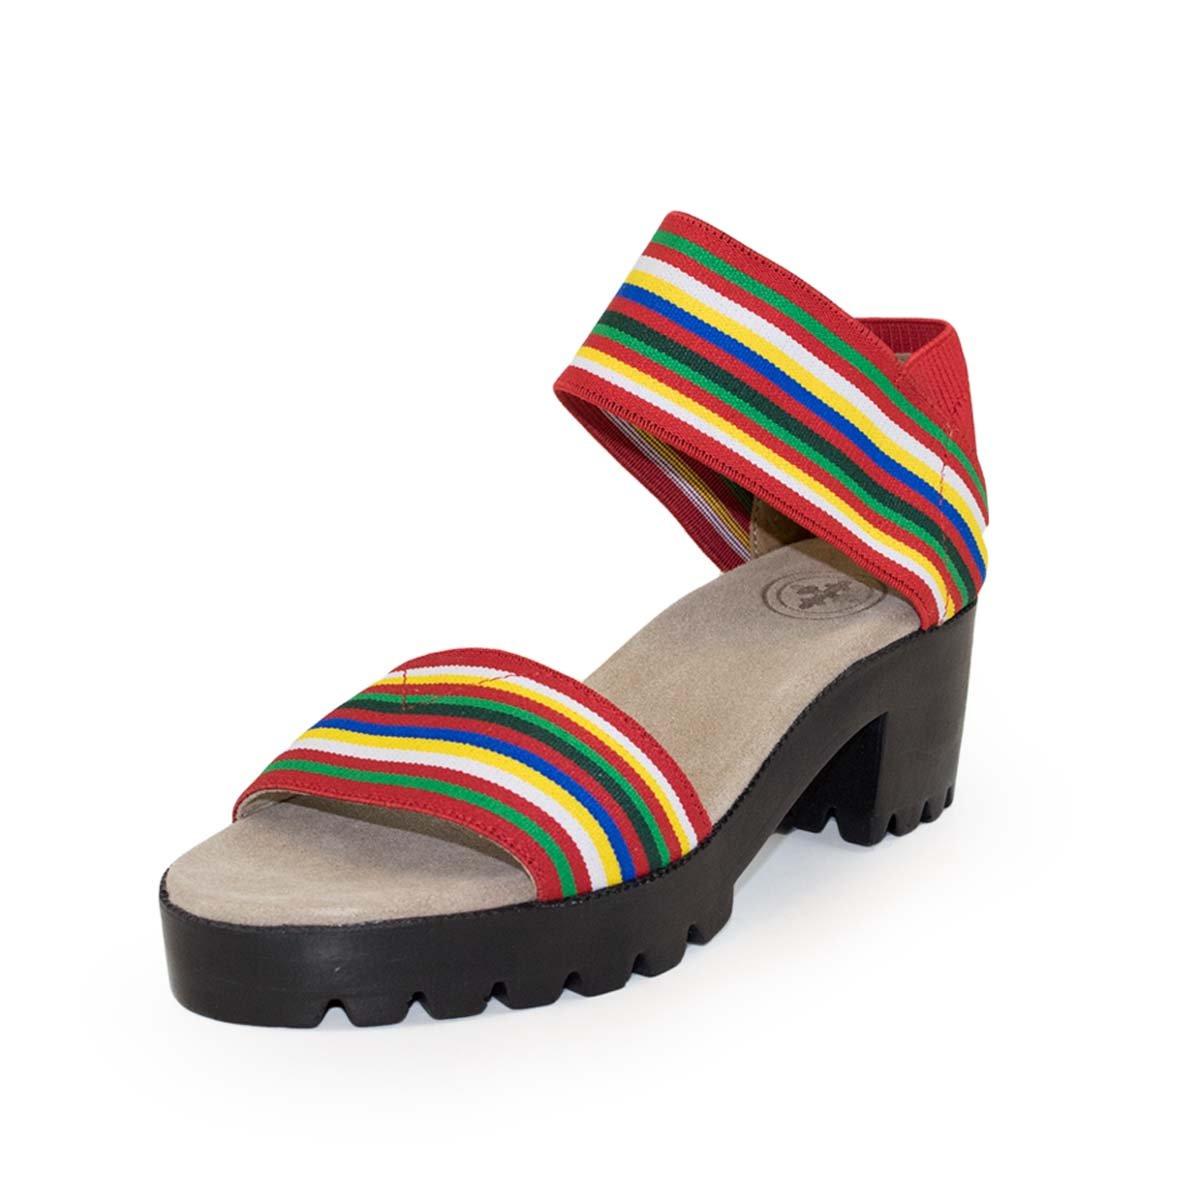 Monterey Lug Sole Sandal by Charleston Shoe Co. B07DTKHQXW 6 B(M) US|Red Multi Striped